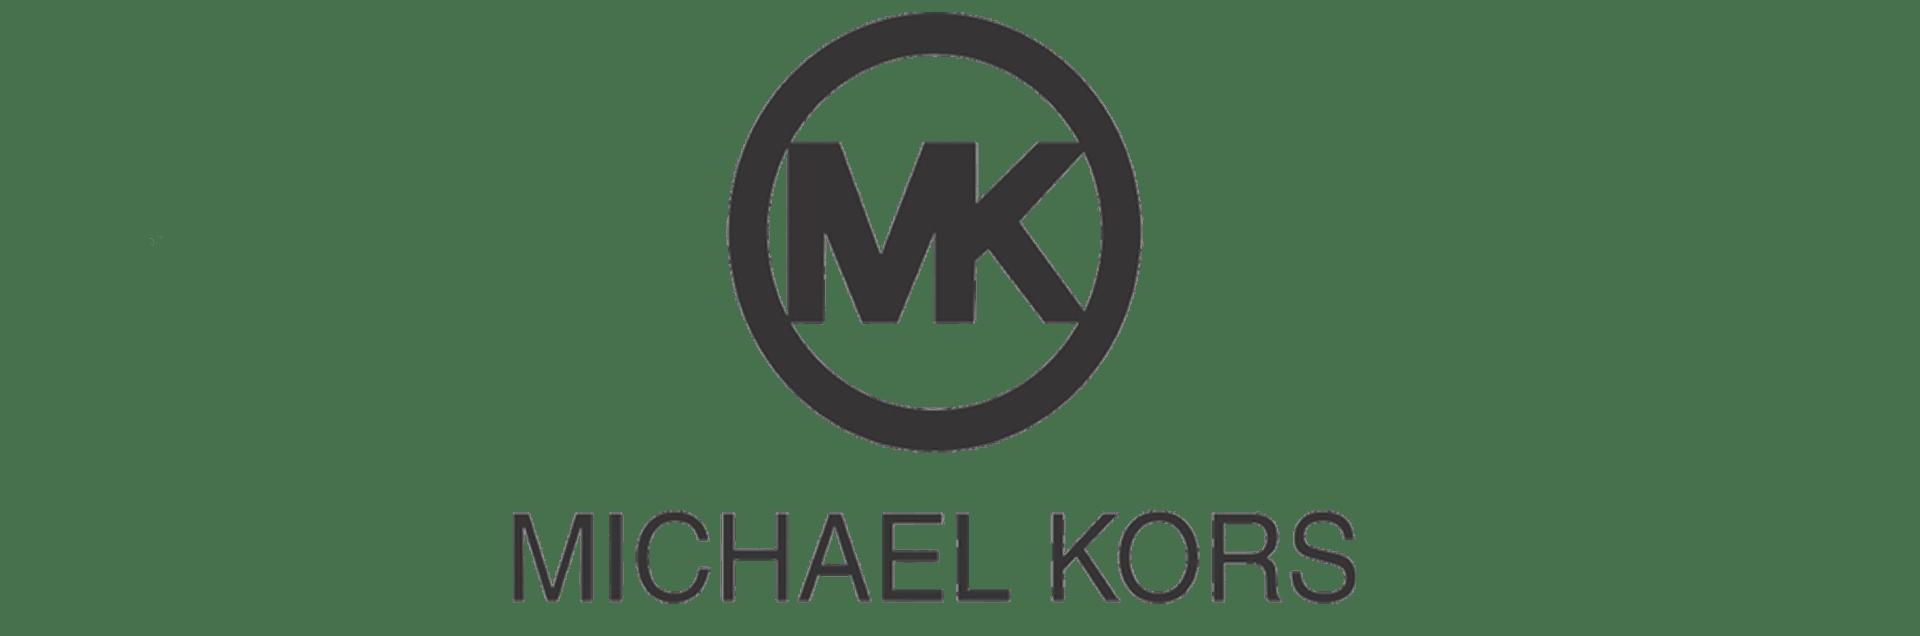 fendi 1 5 copy - مایکل کورس Michael Kors